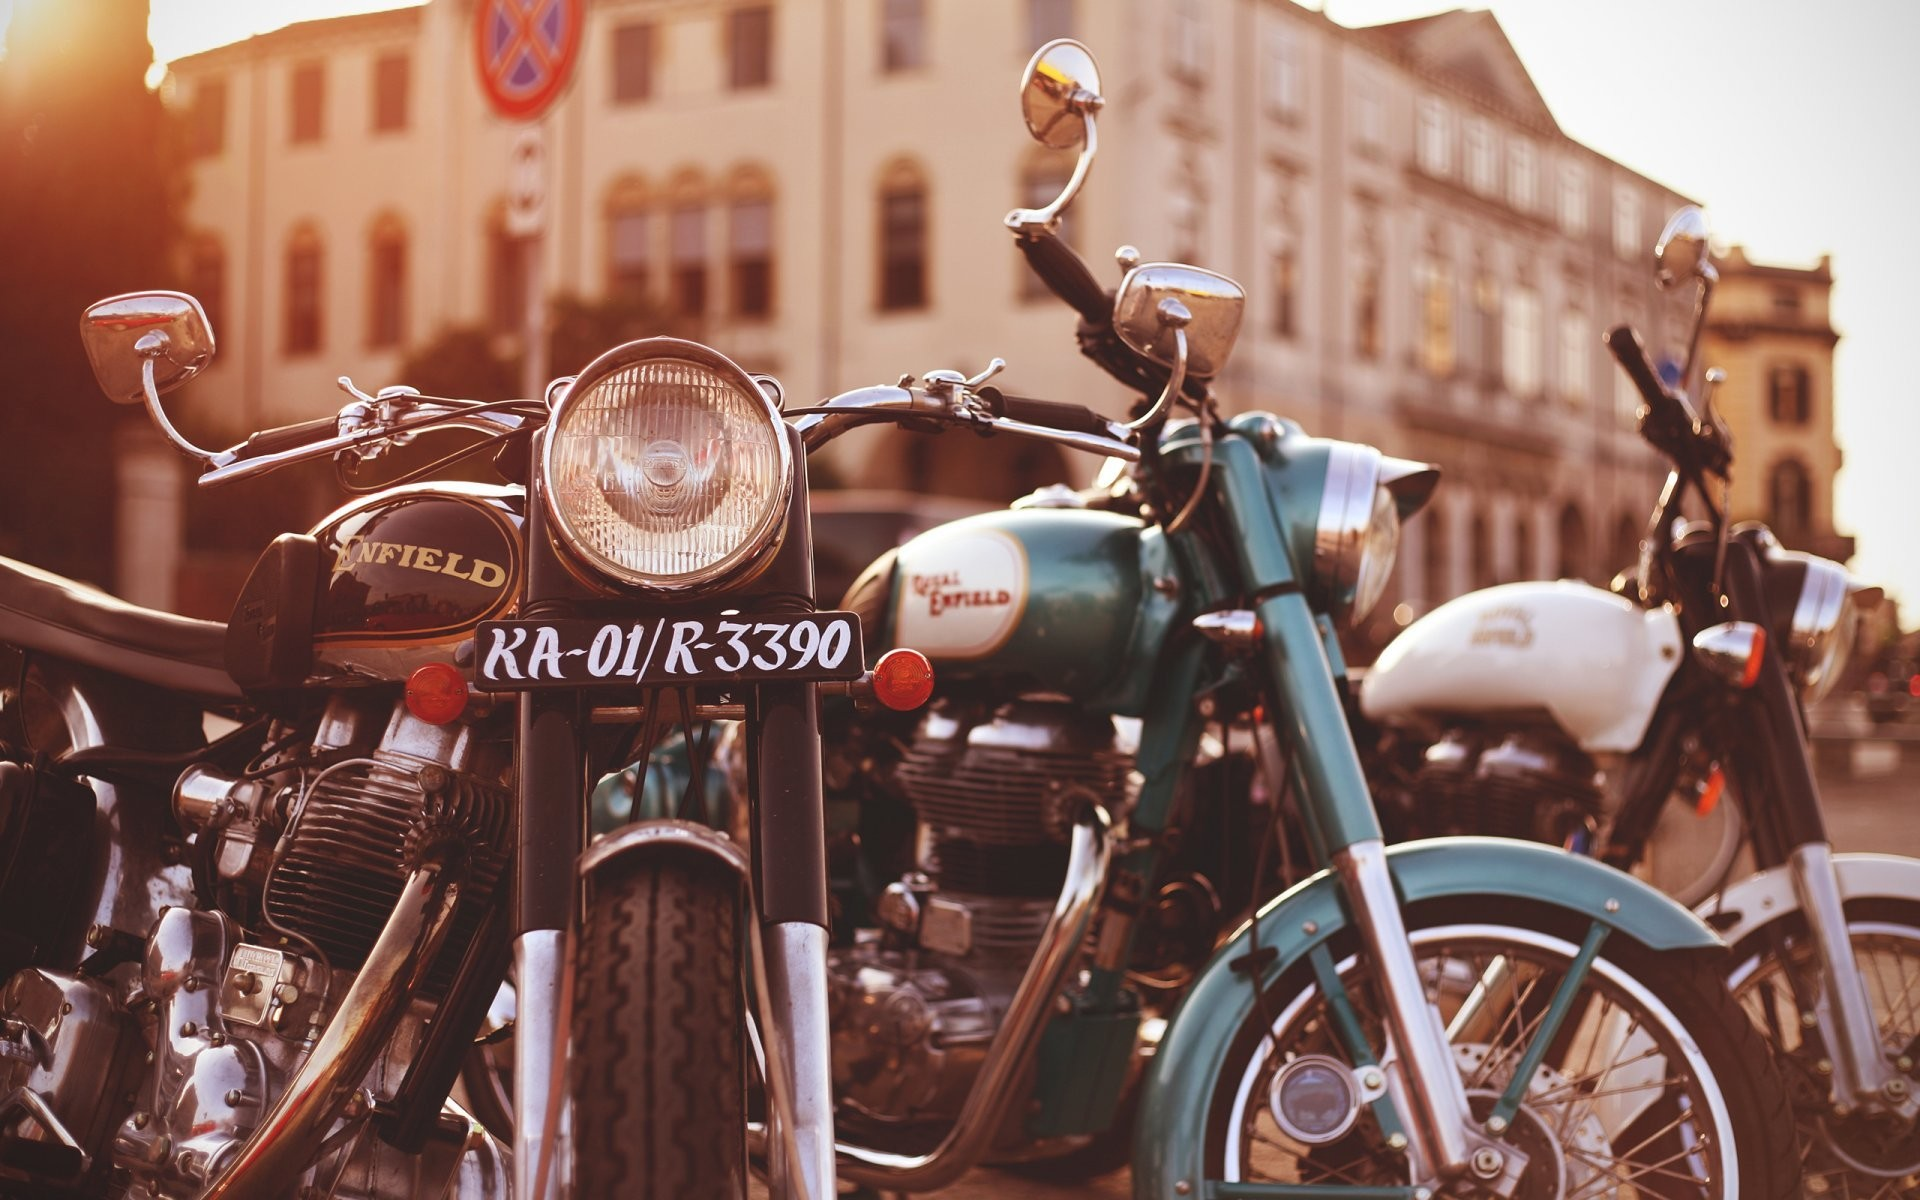 vintage motorbike motorcycle classic cafe racer